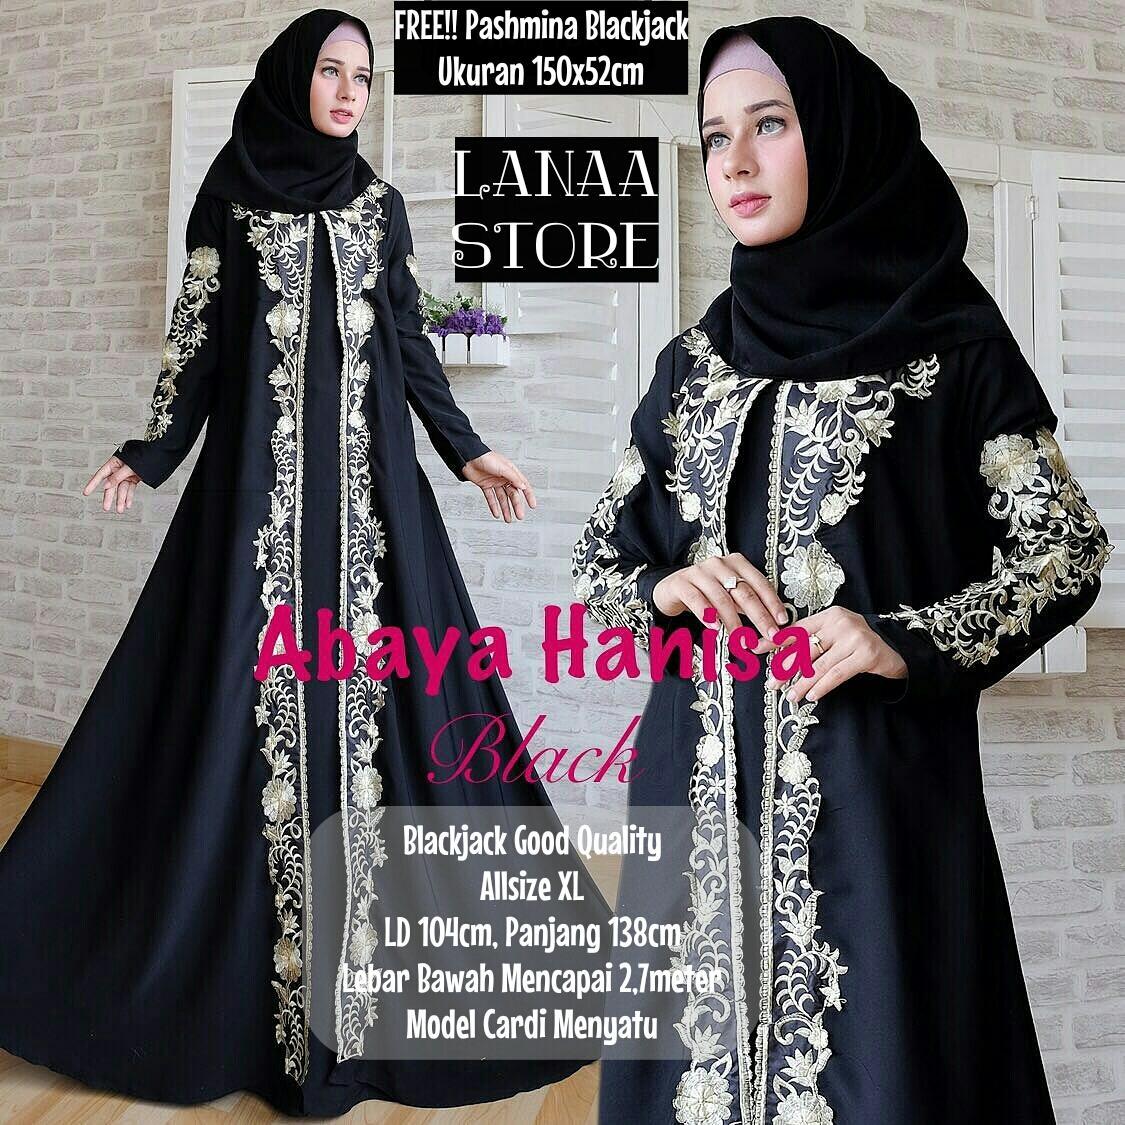 Baju Gamis Hitam Wanita Muslimah Modern Terbaru / Maxi Dress Abaya Hanisa Black-FREE PASHMINA